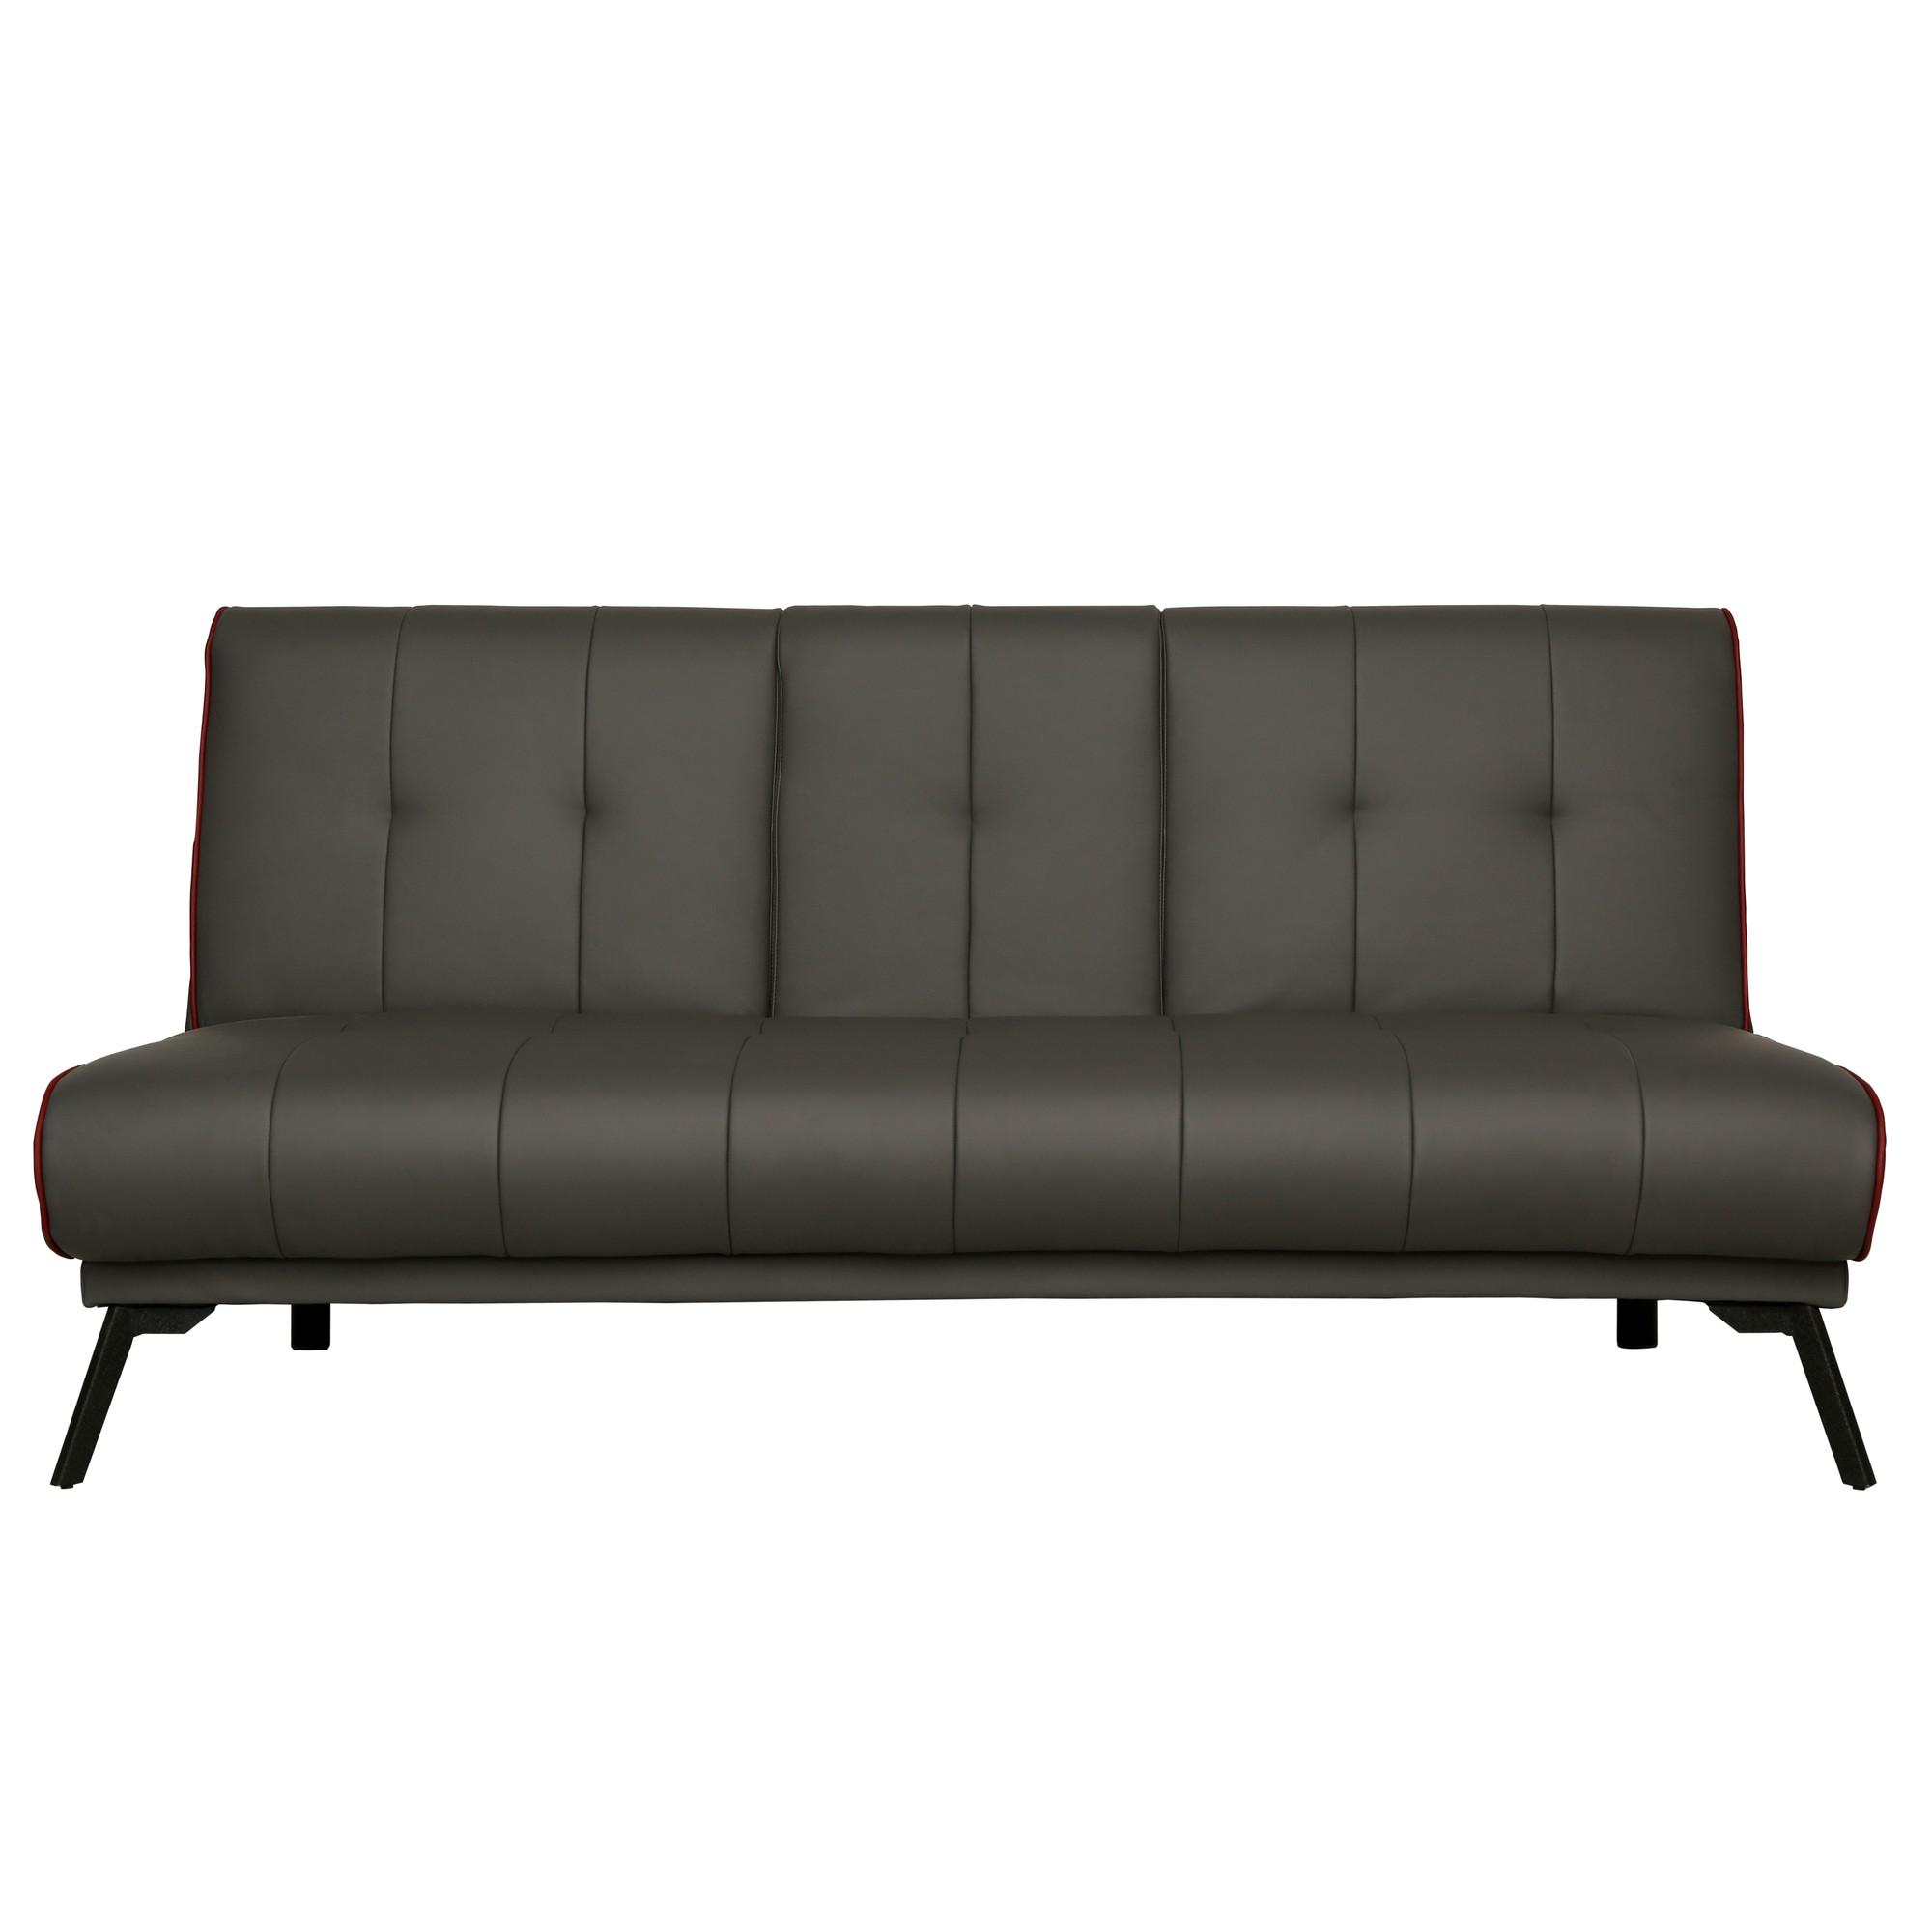 Ultimate Cinema Sofa Bed